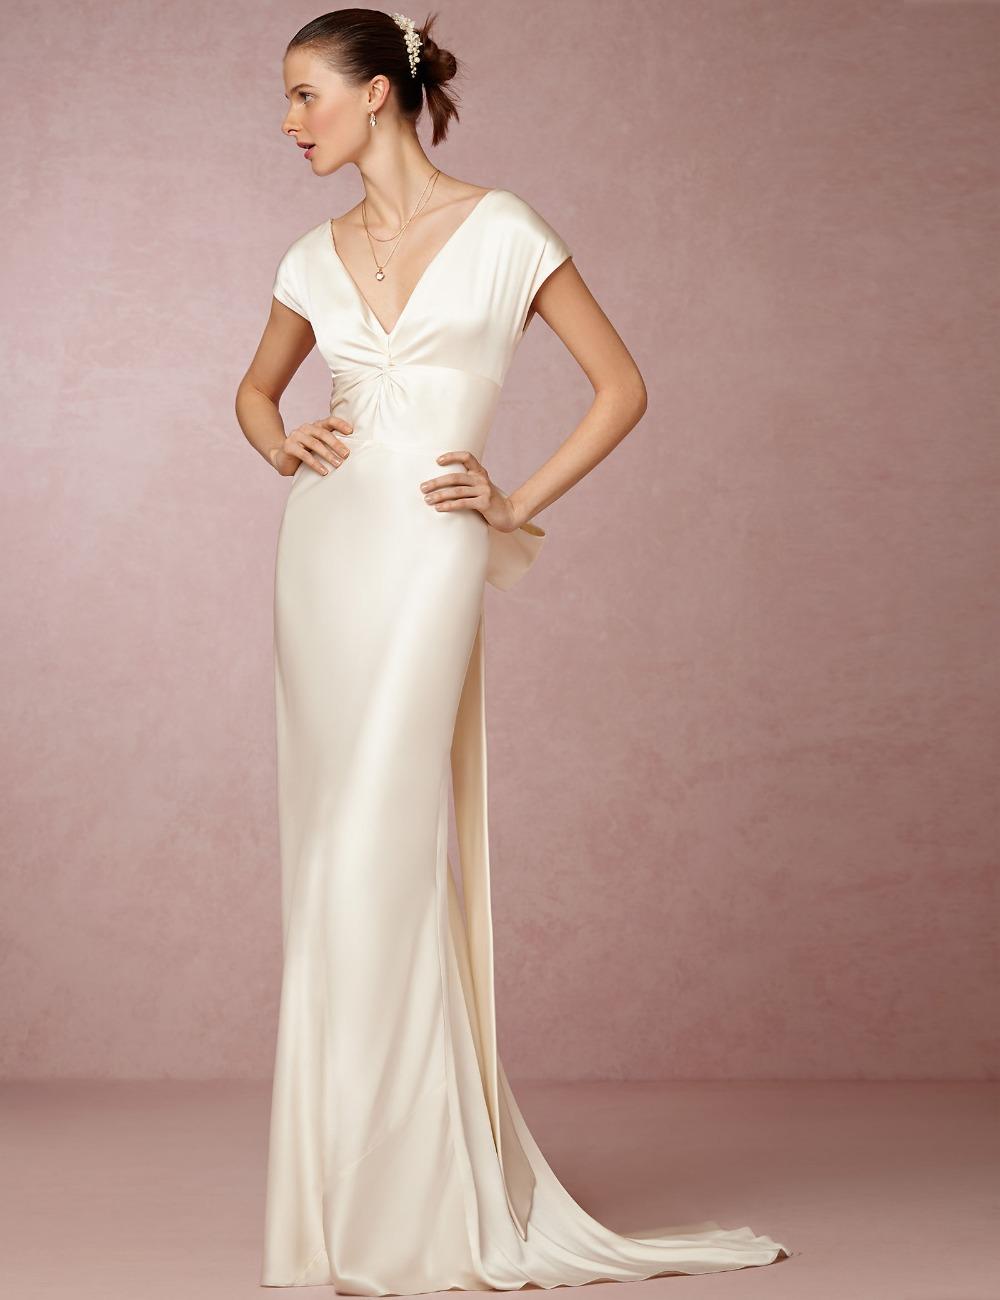 silk wedding dresses photo - 1